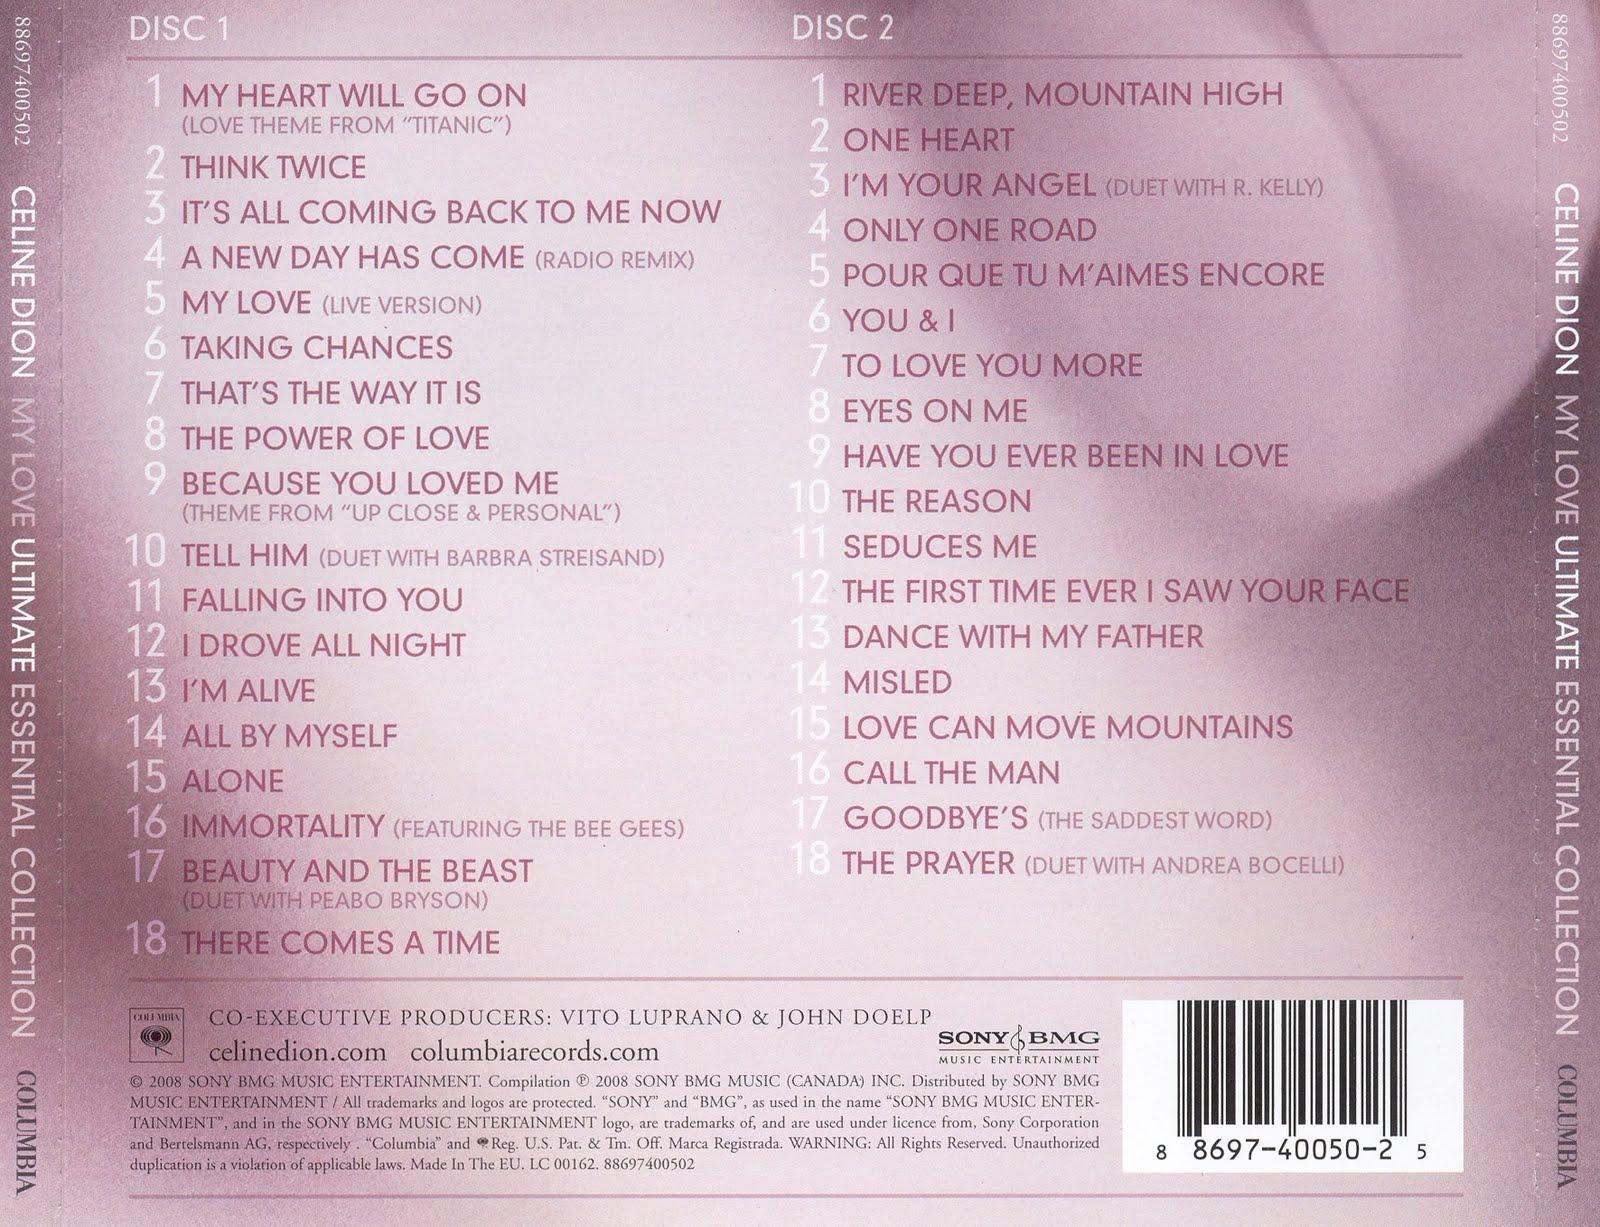 http://4.bp.blogspot.com/_YJM766qf5ps/TBUXmJJMWzI/AAAAAAAAFtU/w3Hgj6sI7vU/s1600/Celine+Dion+-+My+Love+%28Ultimate+Essential+Collection%29+-+Back.jpg